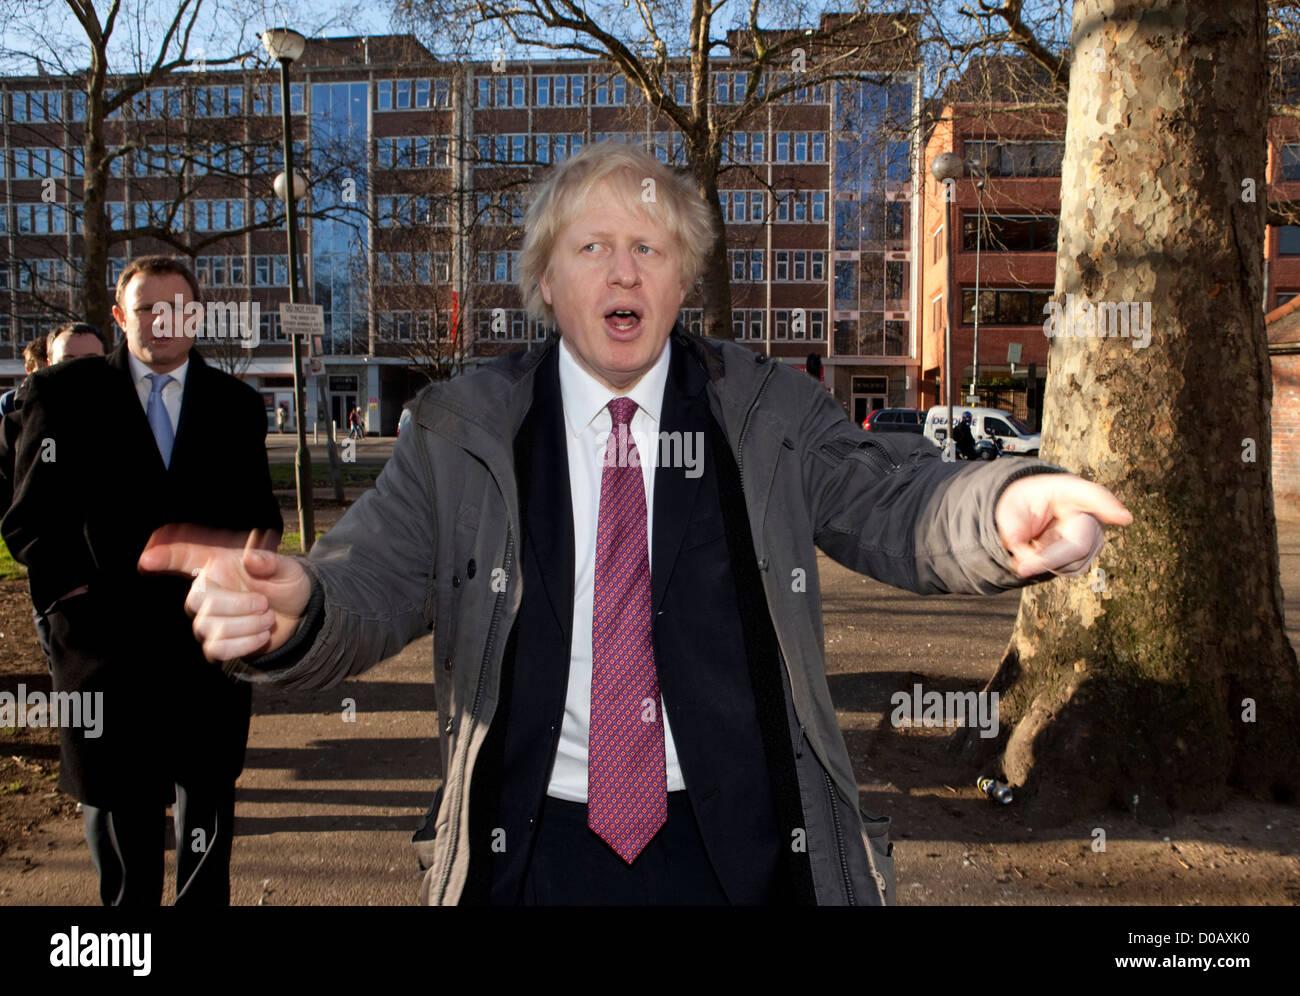 mayor of london Boris Johnson  joined a Safer Neighbourhood Team on a walk around shepherds Bush Market, london - Stock Image